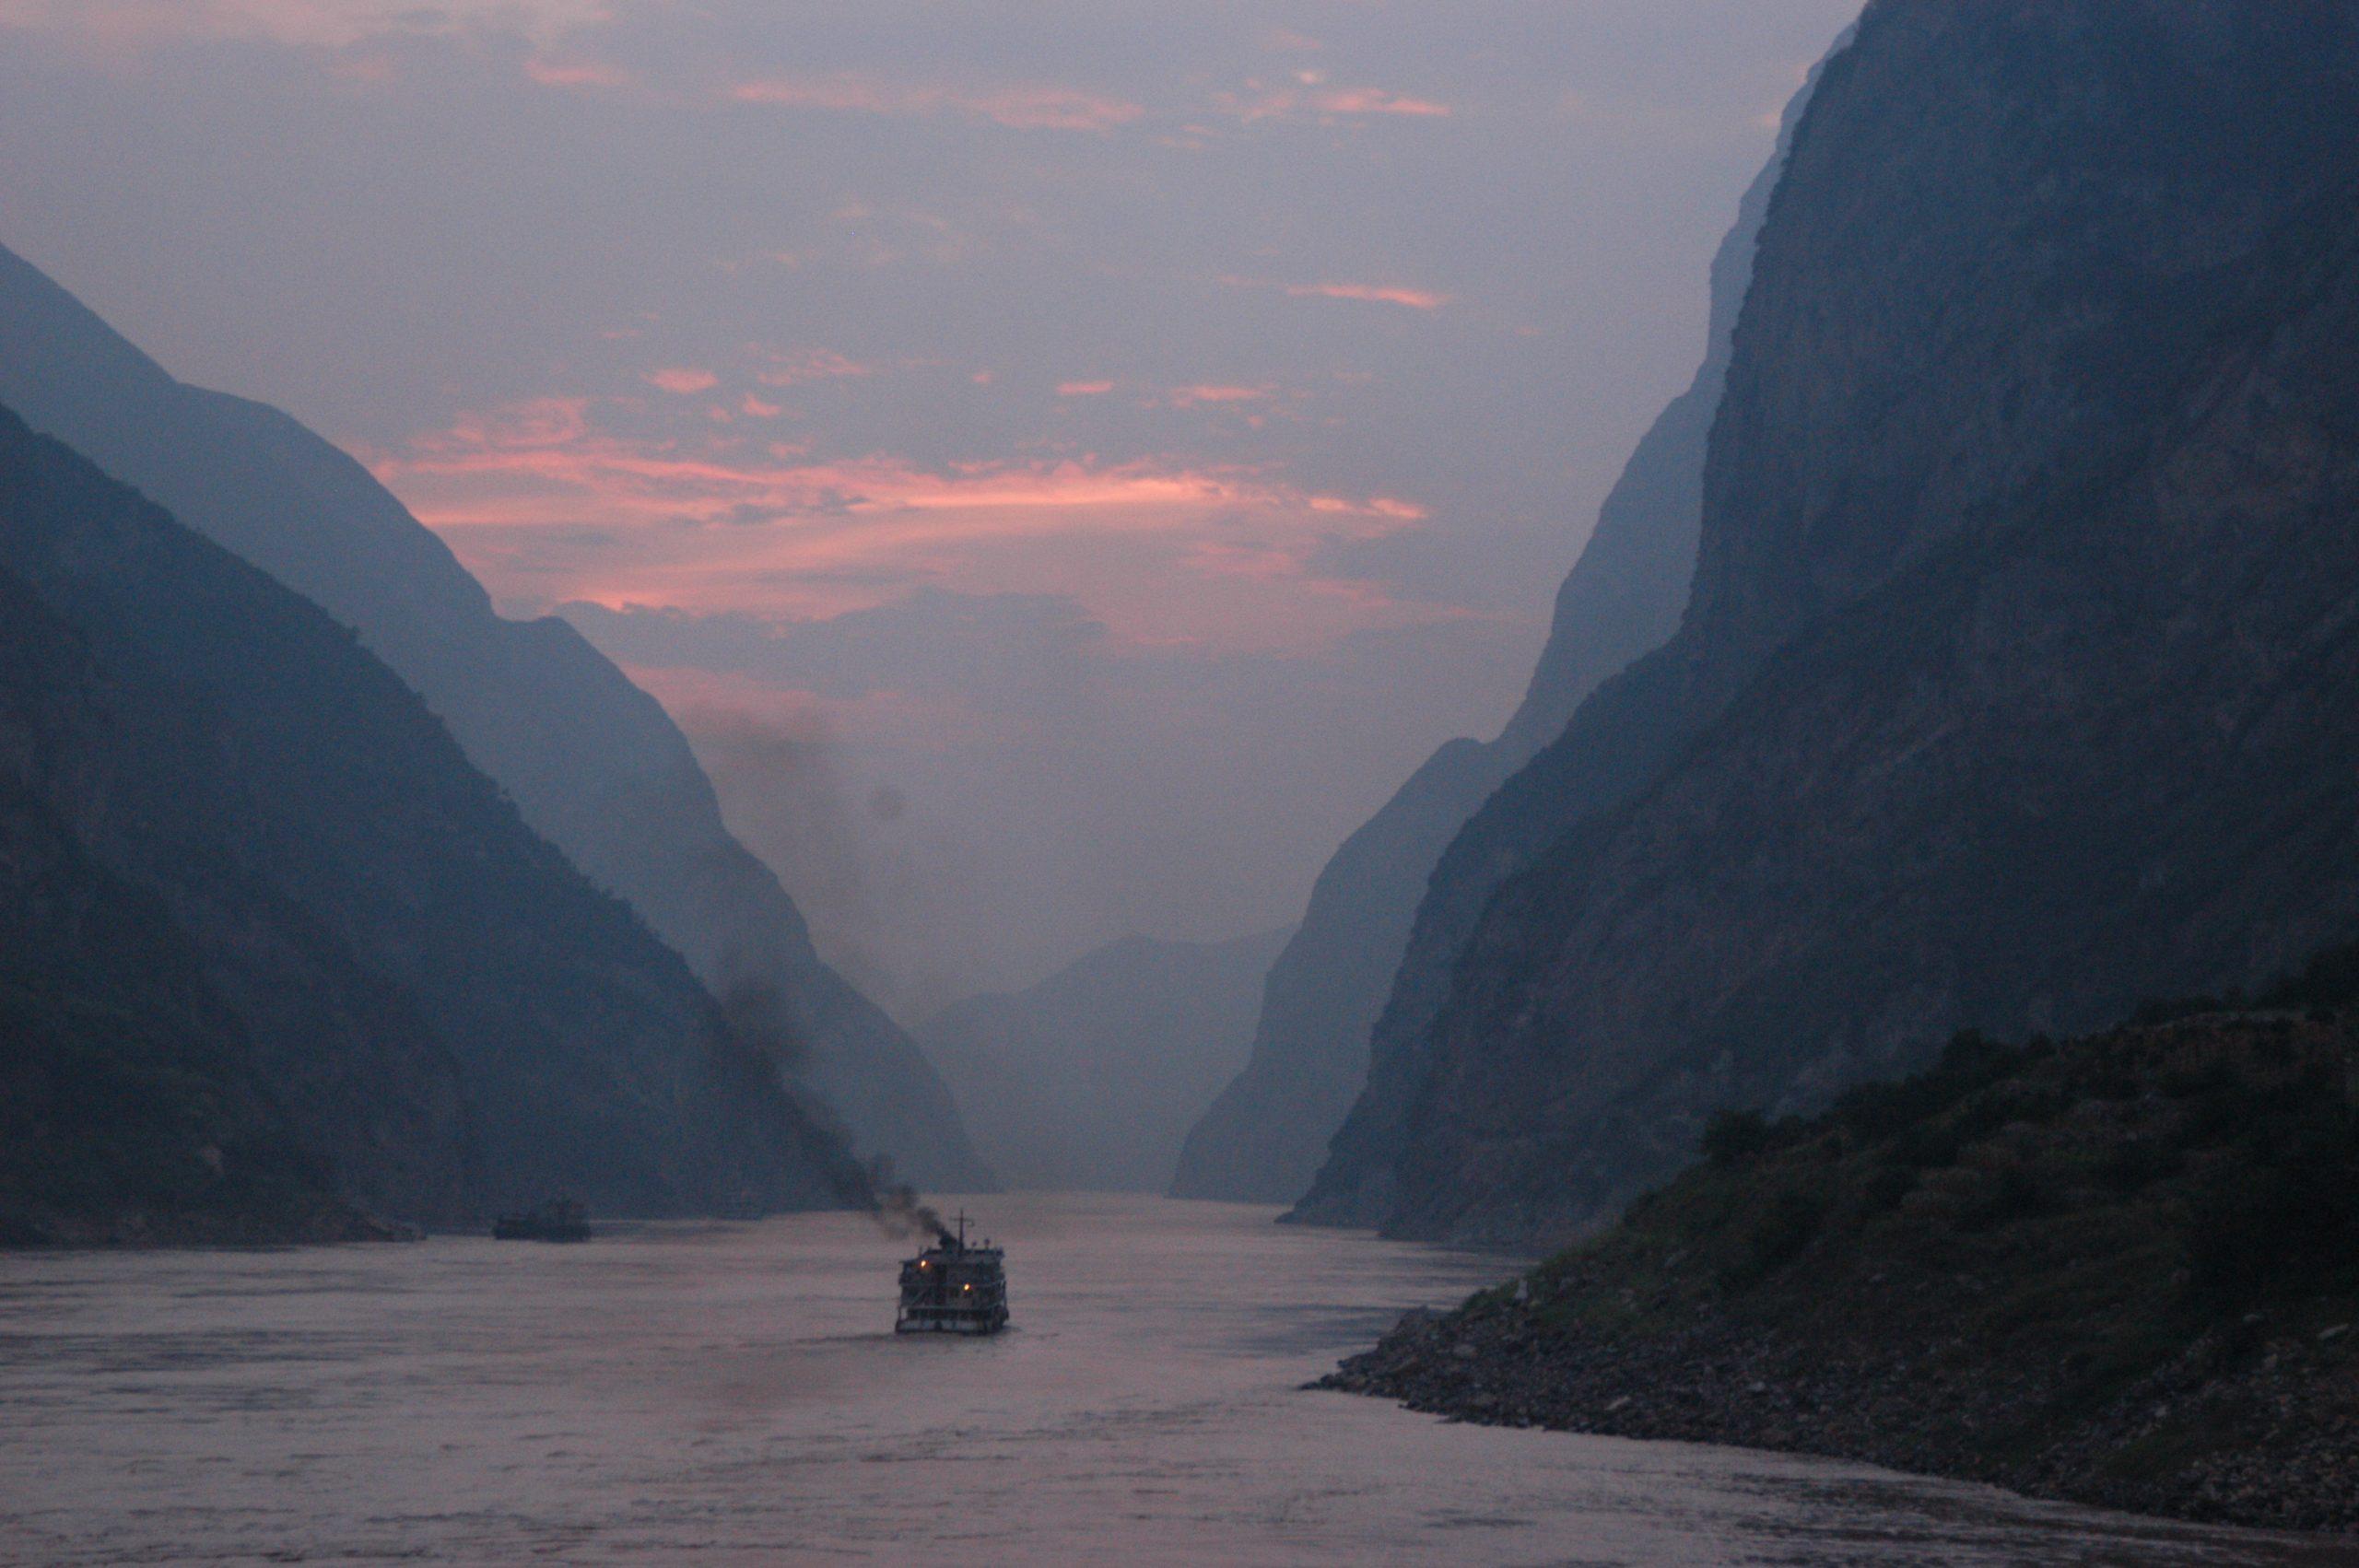 Dusk_on_the_Yangtze_River.jpg